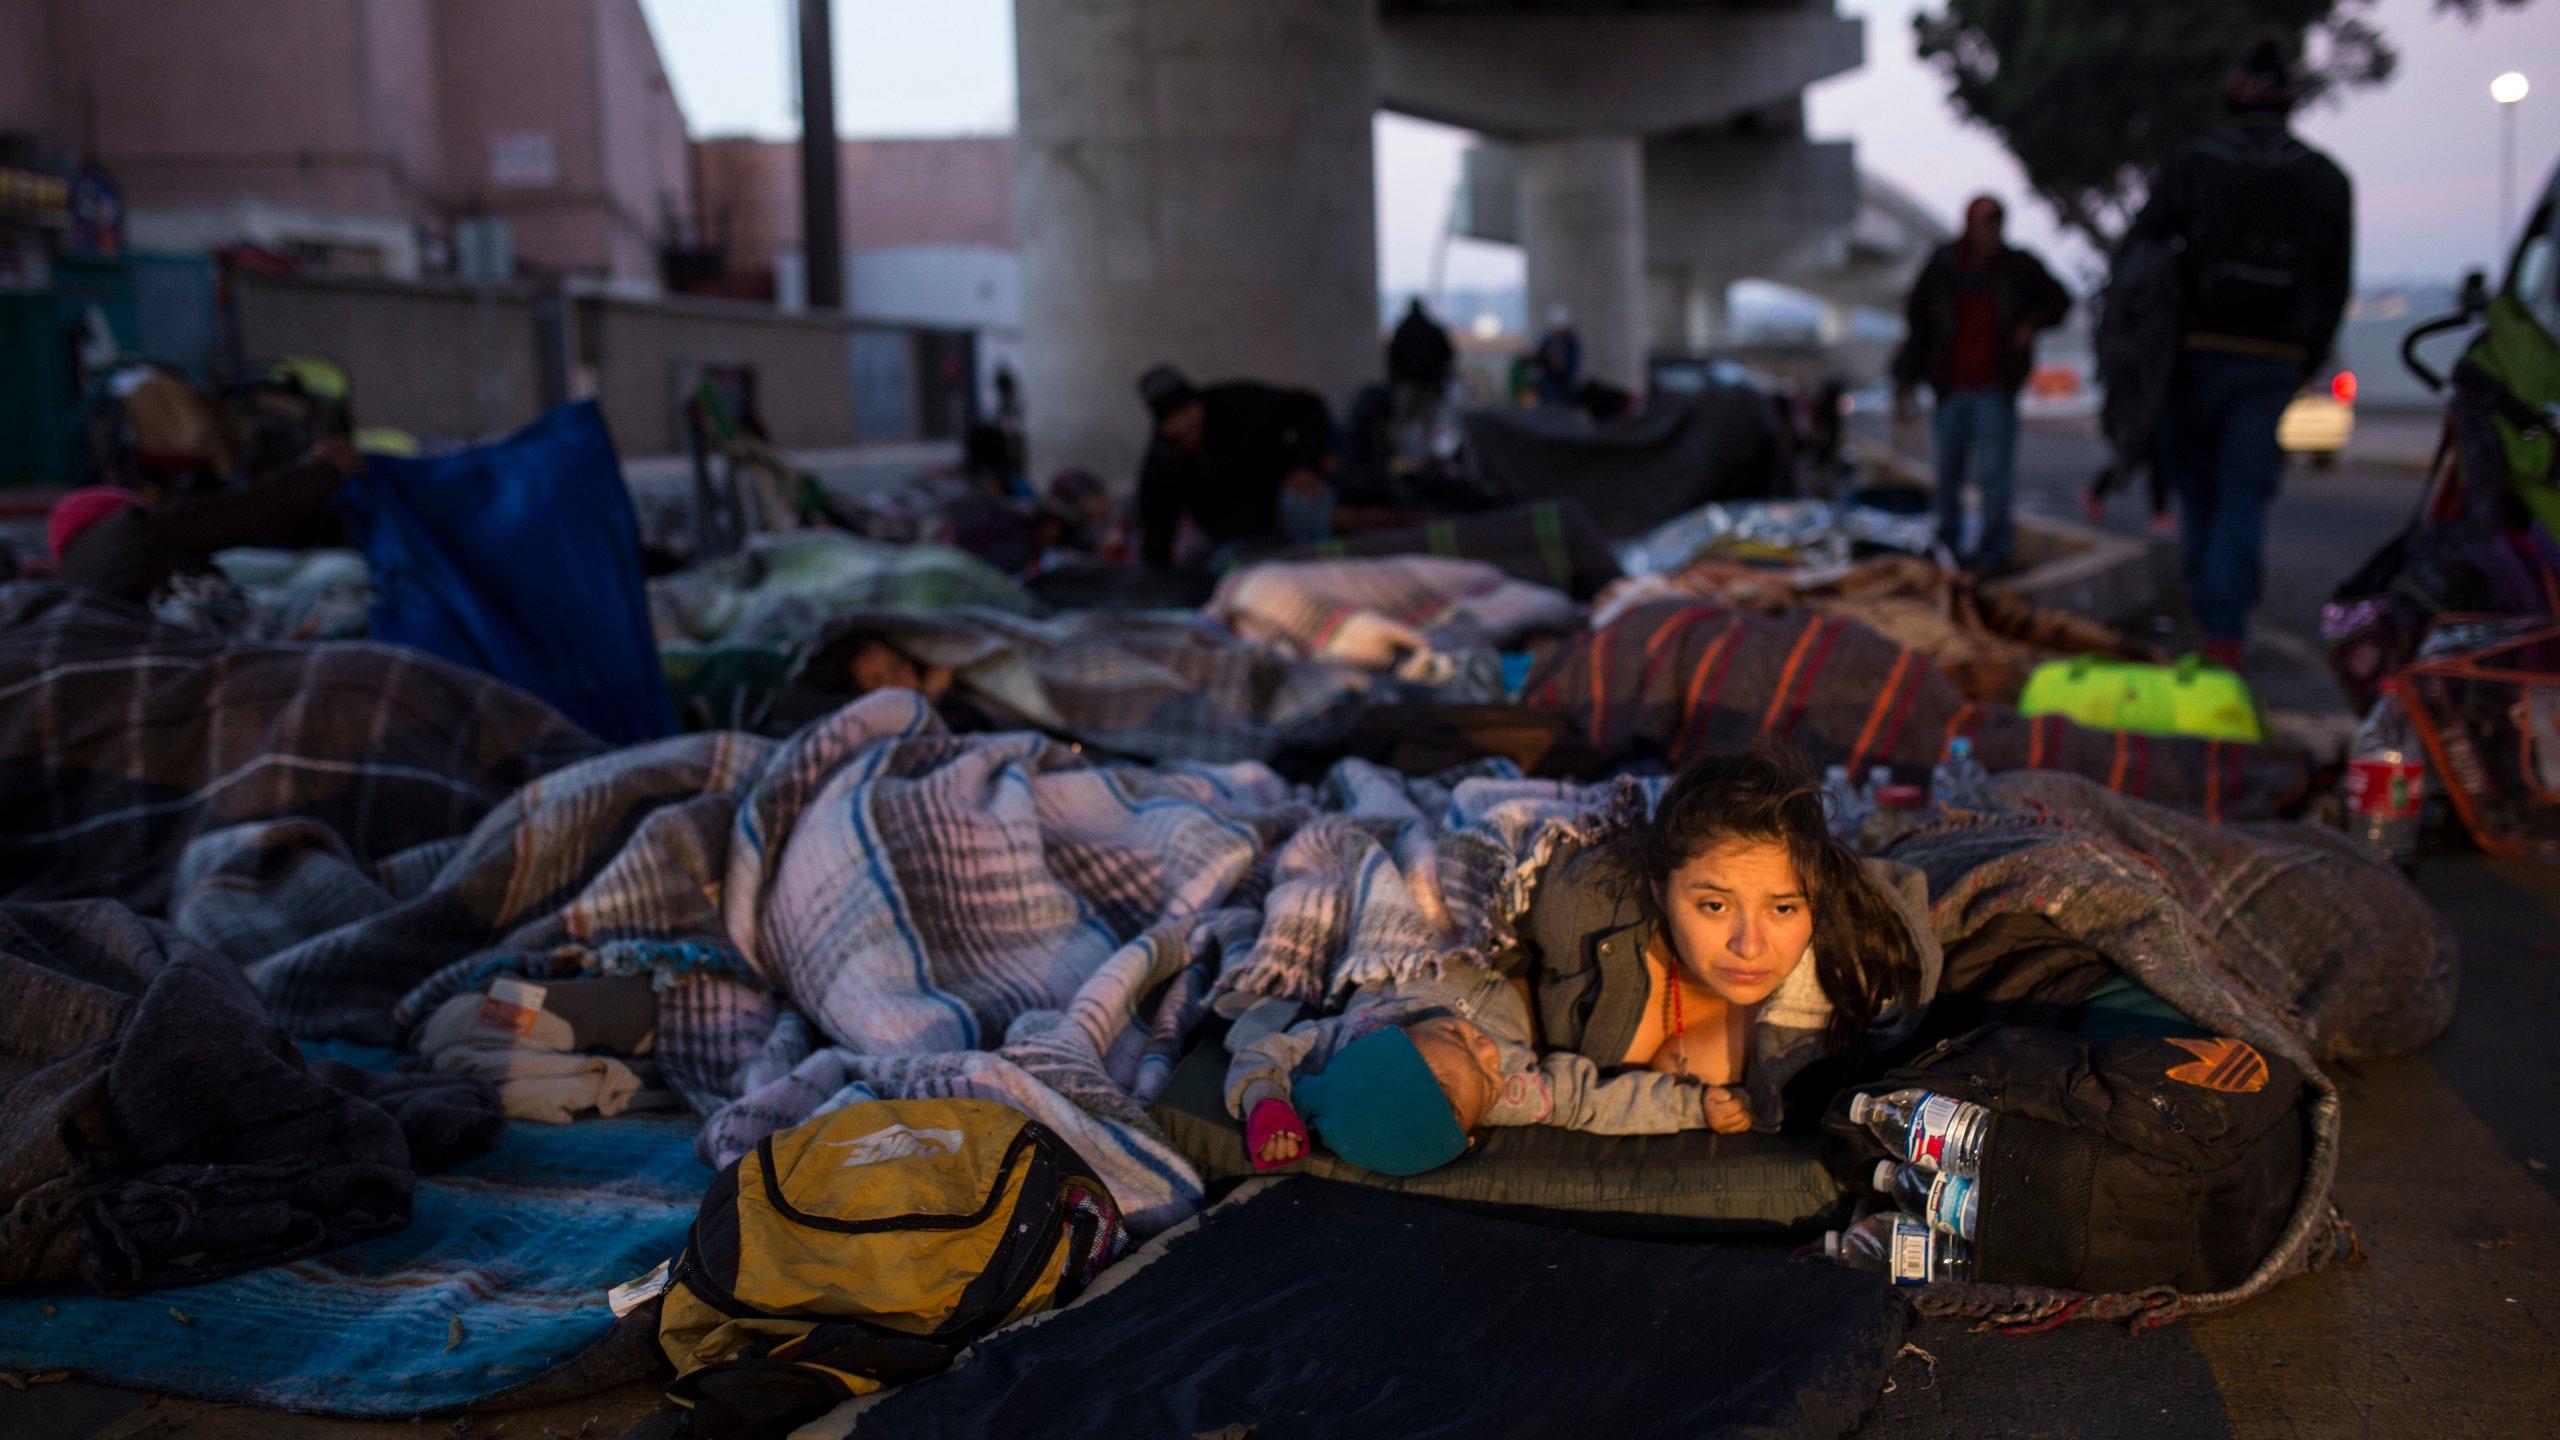 Central_America_Migrant_Caravan_40493-159532.jpg81640135